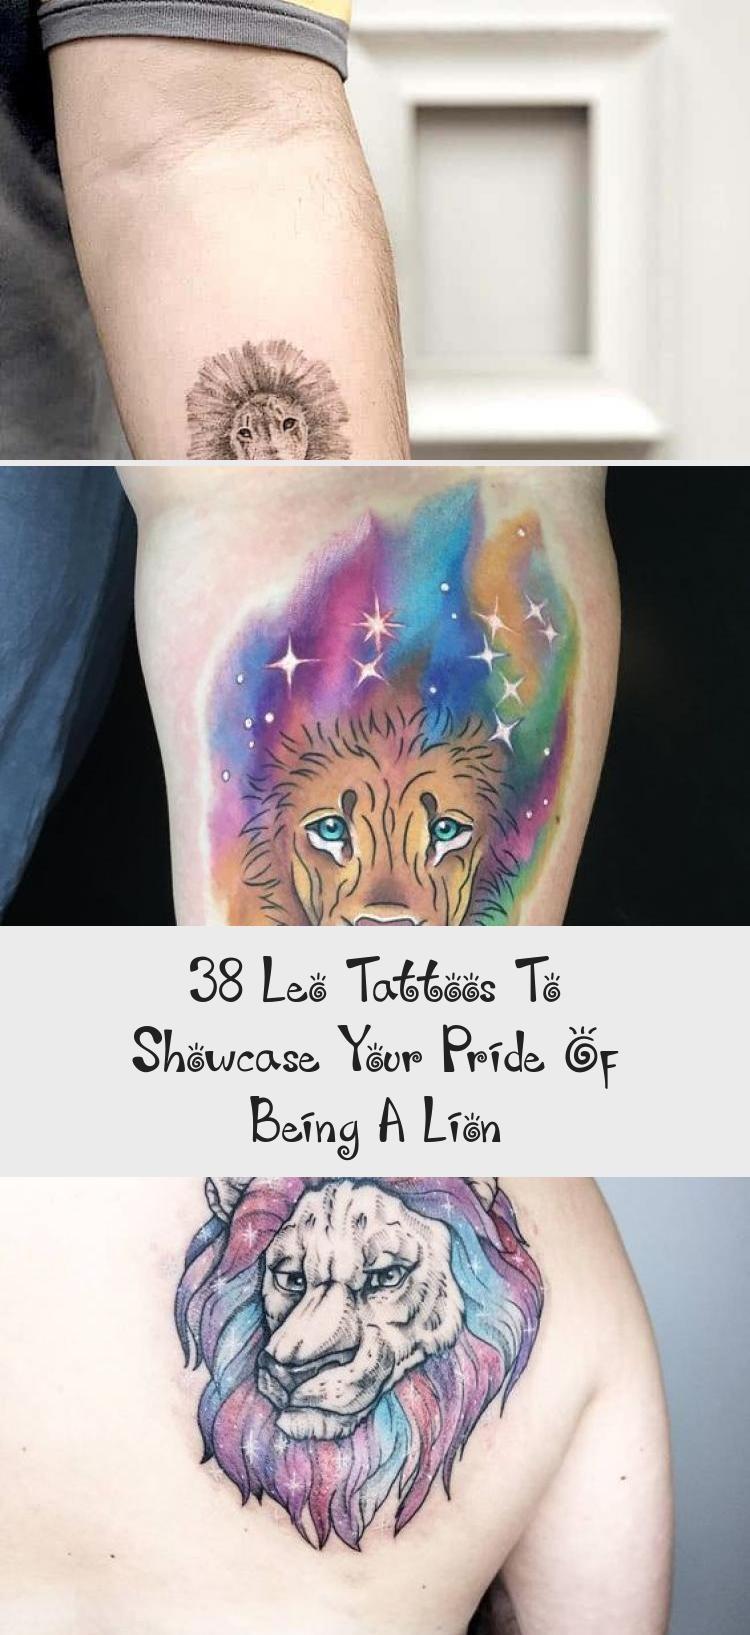 Stunning Leo Zodiac Tattoo Ideas And More Horoscope Tattoos For Leo Women And Leo Girls Ourmindfullife Com In 2020 Leo Zodiac Tattoos Horoscope Tattoos Leo Tattoos